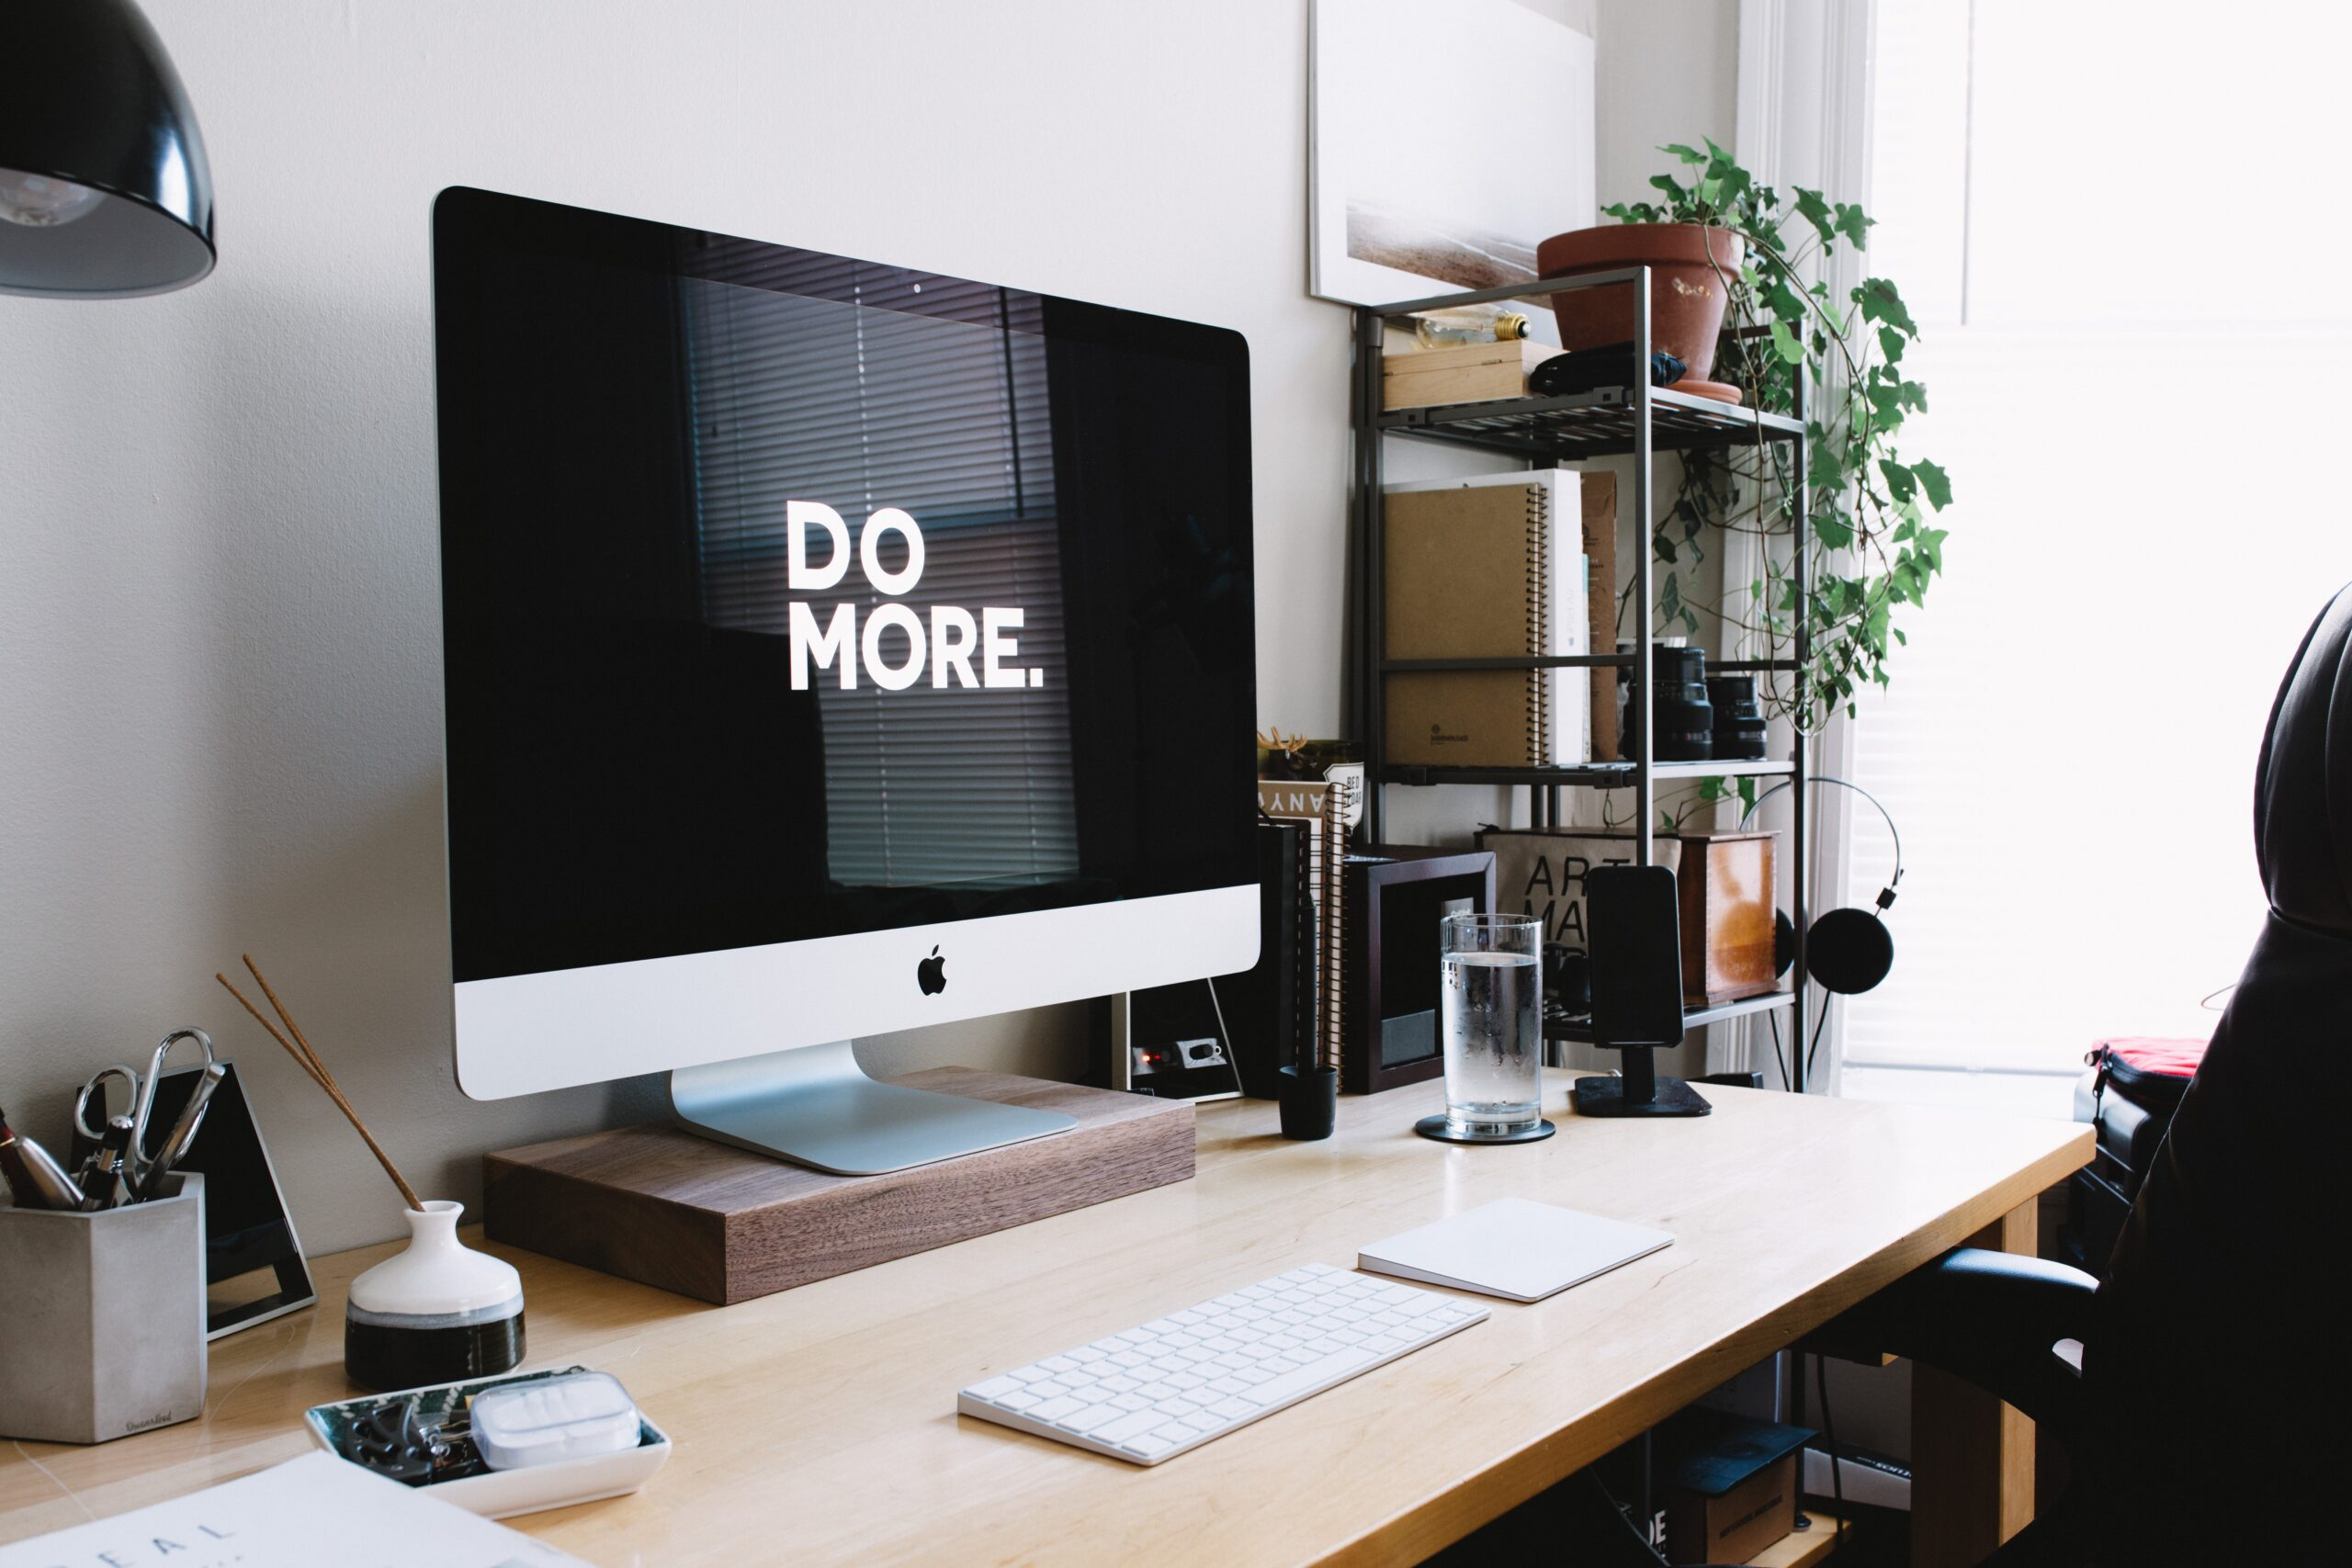 Do more written on PC screen